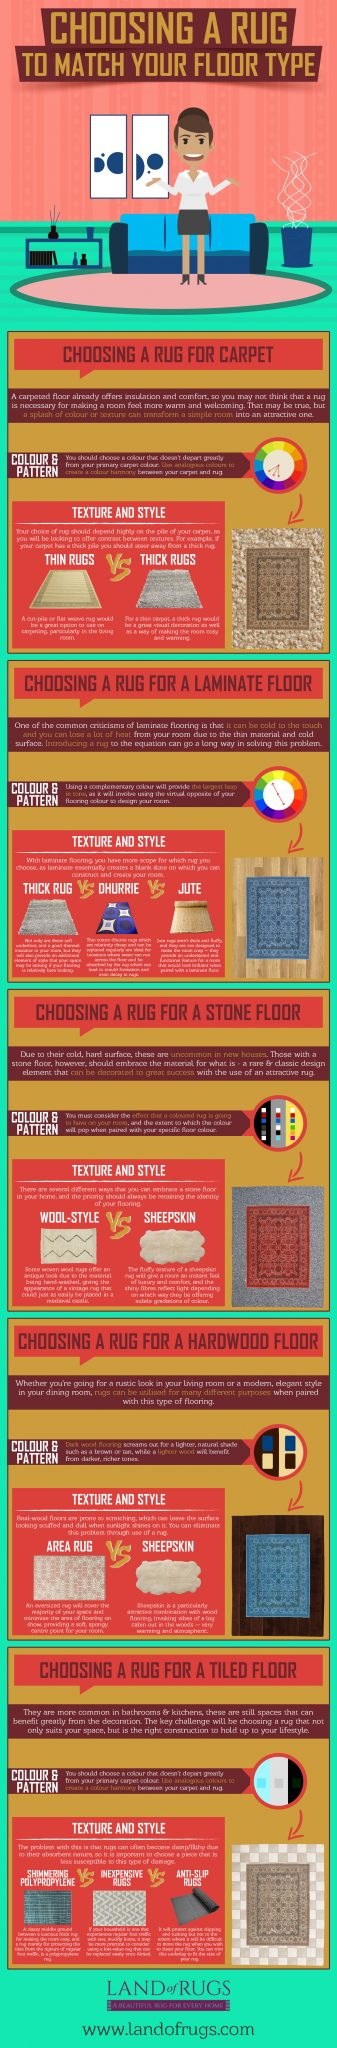 Tips for Matching a Rug with Flooring at https://lukeosaurusandme.co.uk